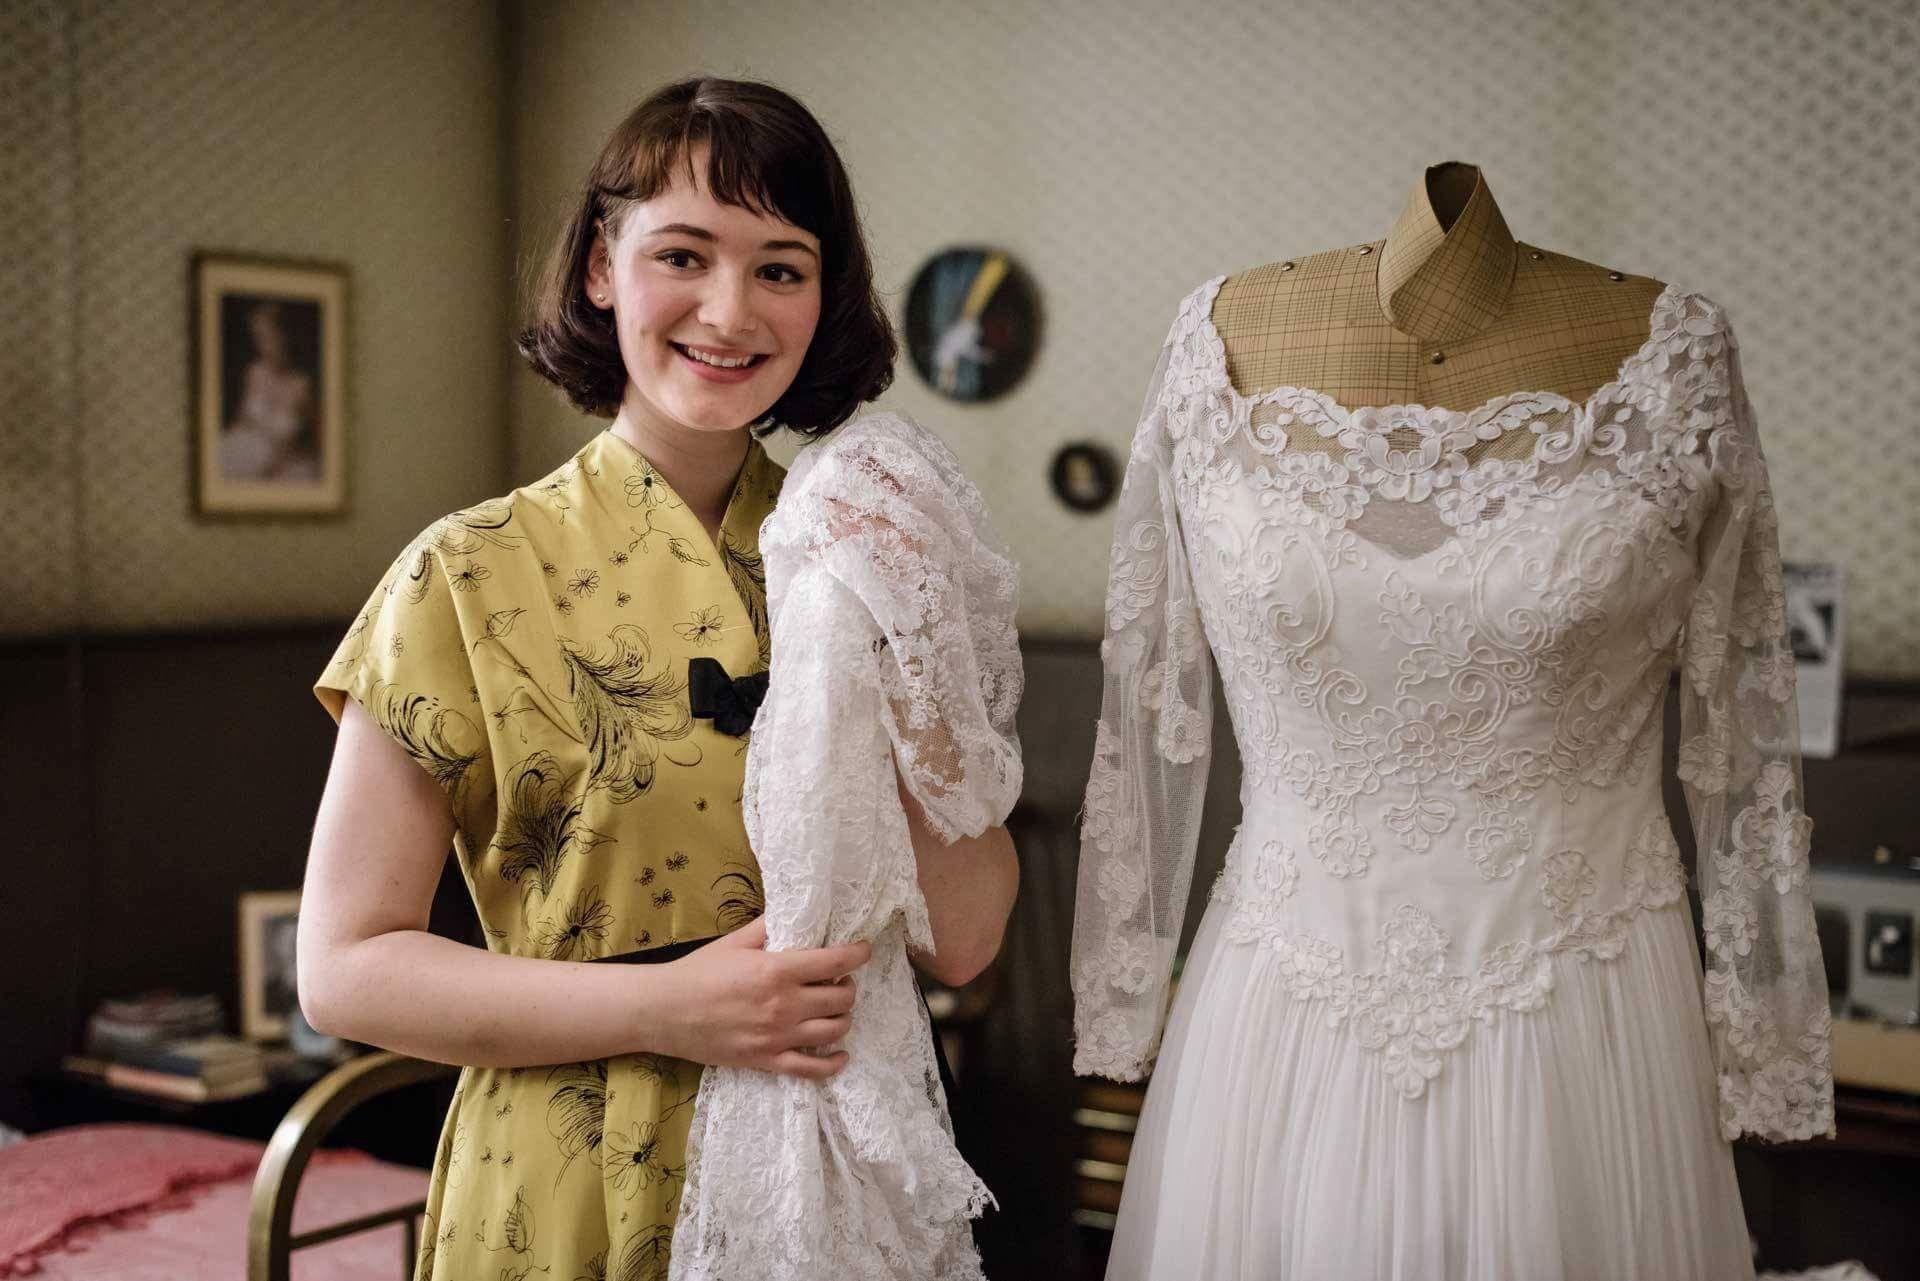 Ku'damm 56 - Helga Schöllack (Maria Ehrich)   Dresses, Wedding dresses  lace, Wedding dresses